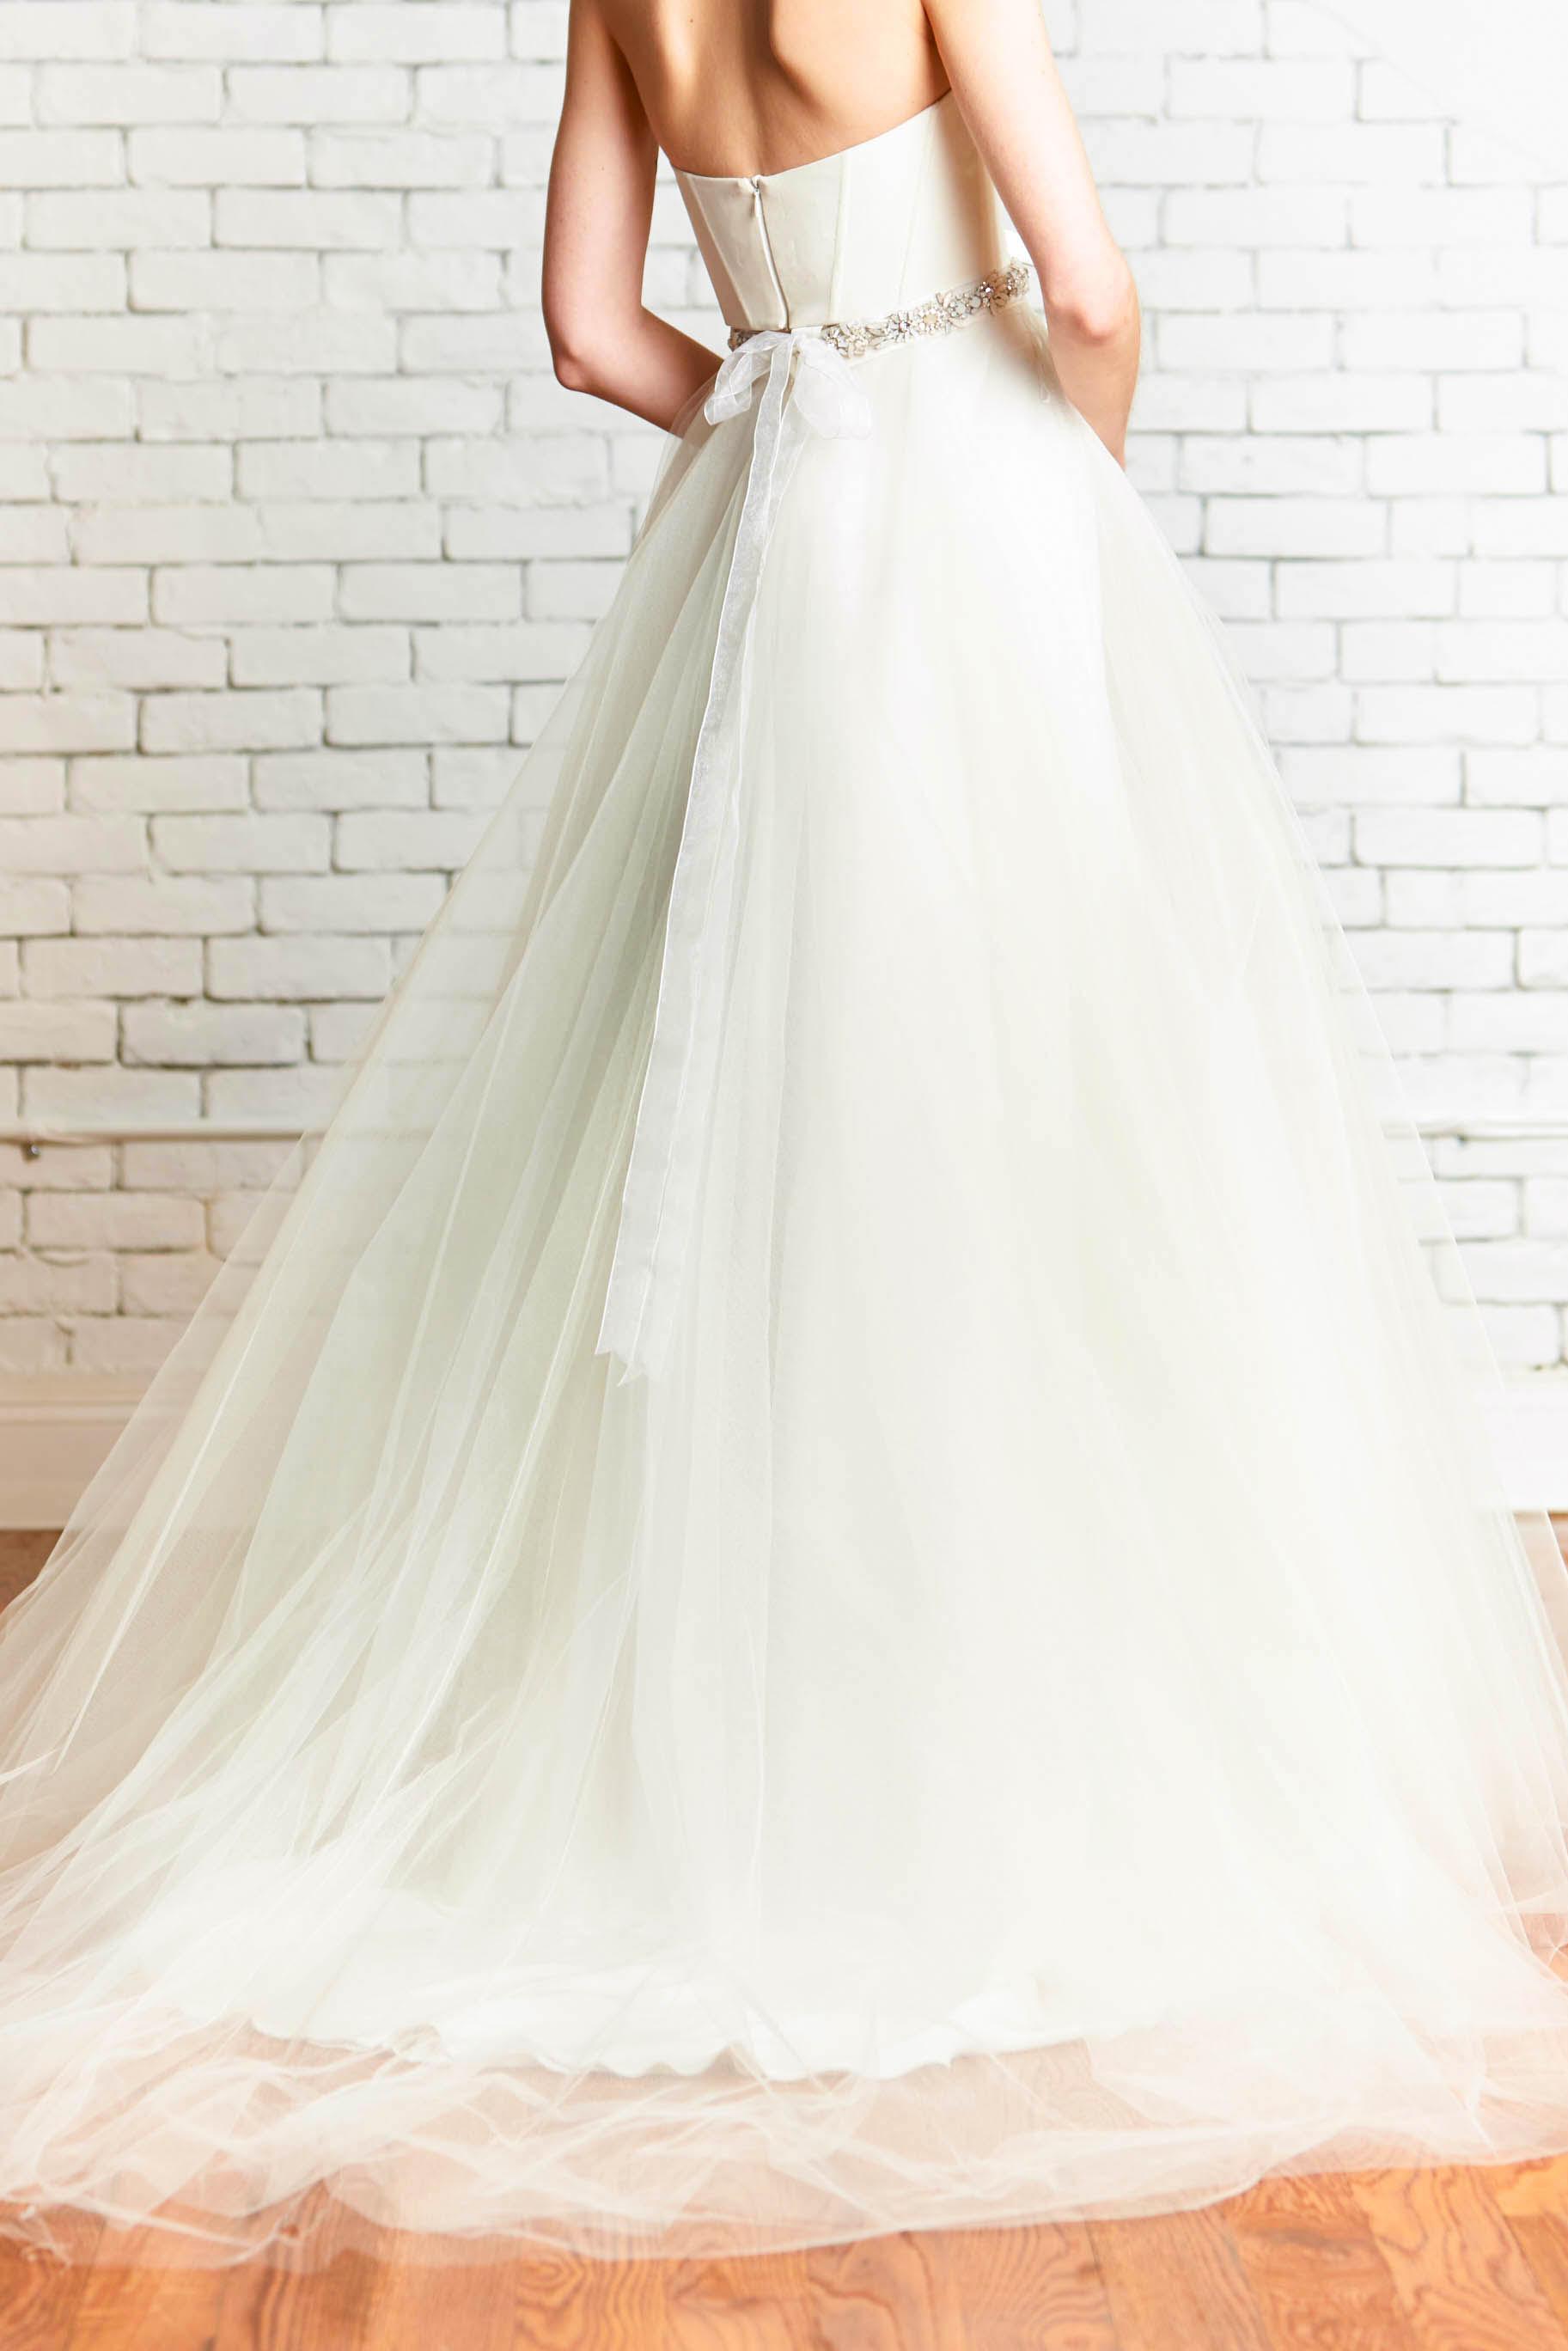 Jordan_2back_Ballgown_Tulle_Skirt_Wedding_Separates.jpg